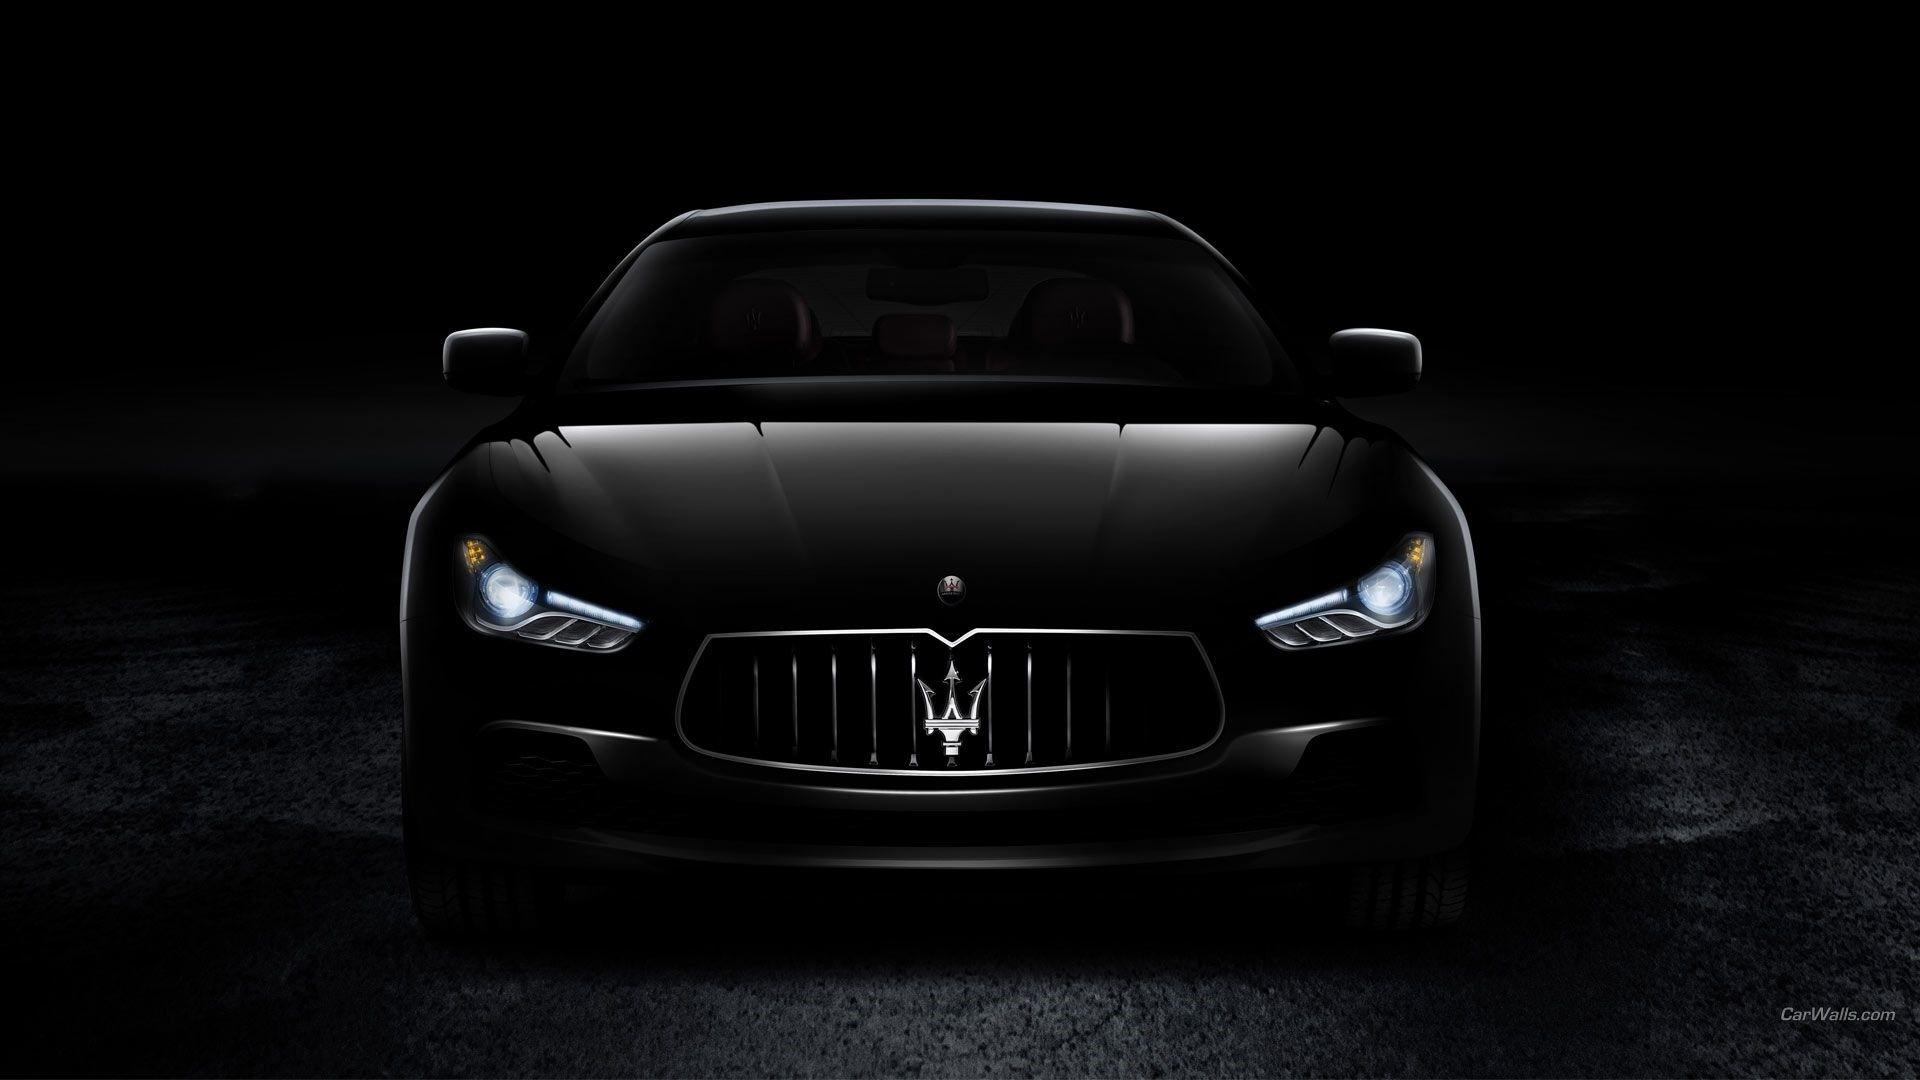 Maserati Wallpaper Image